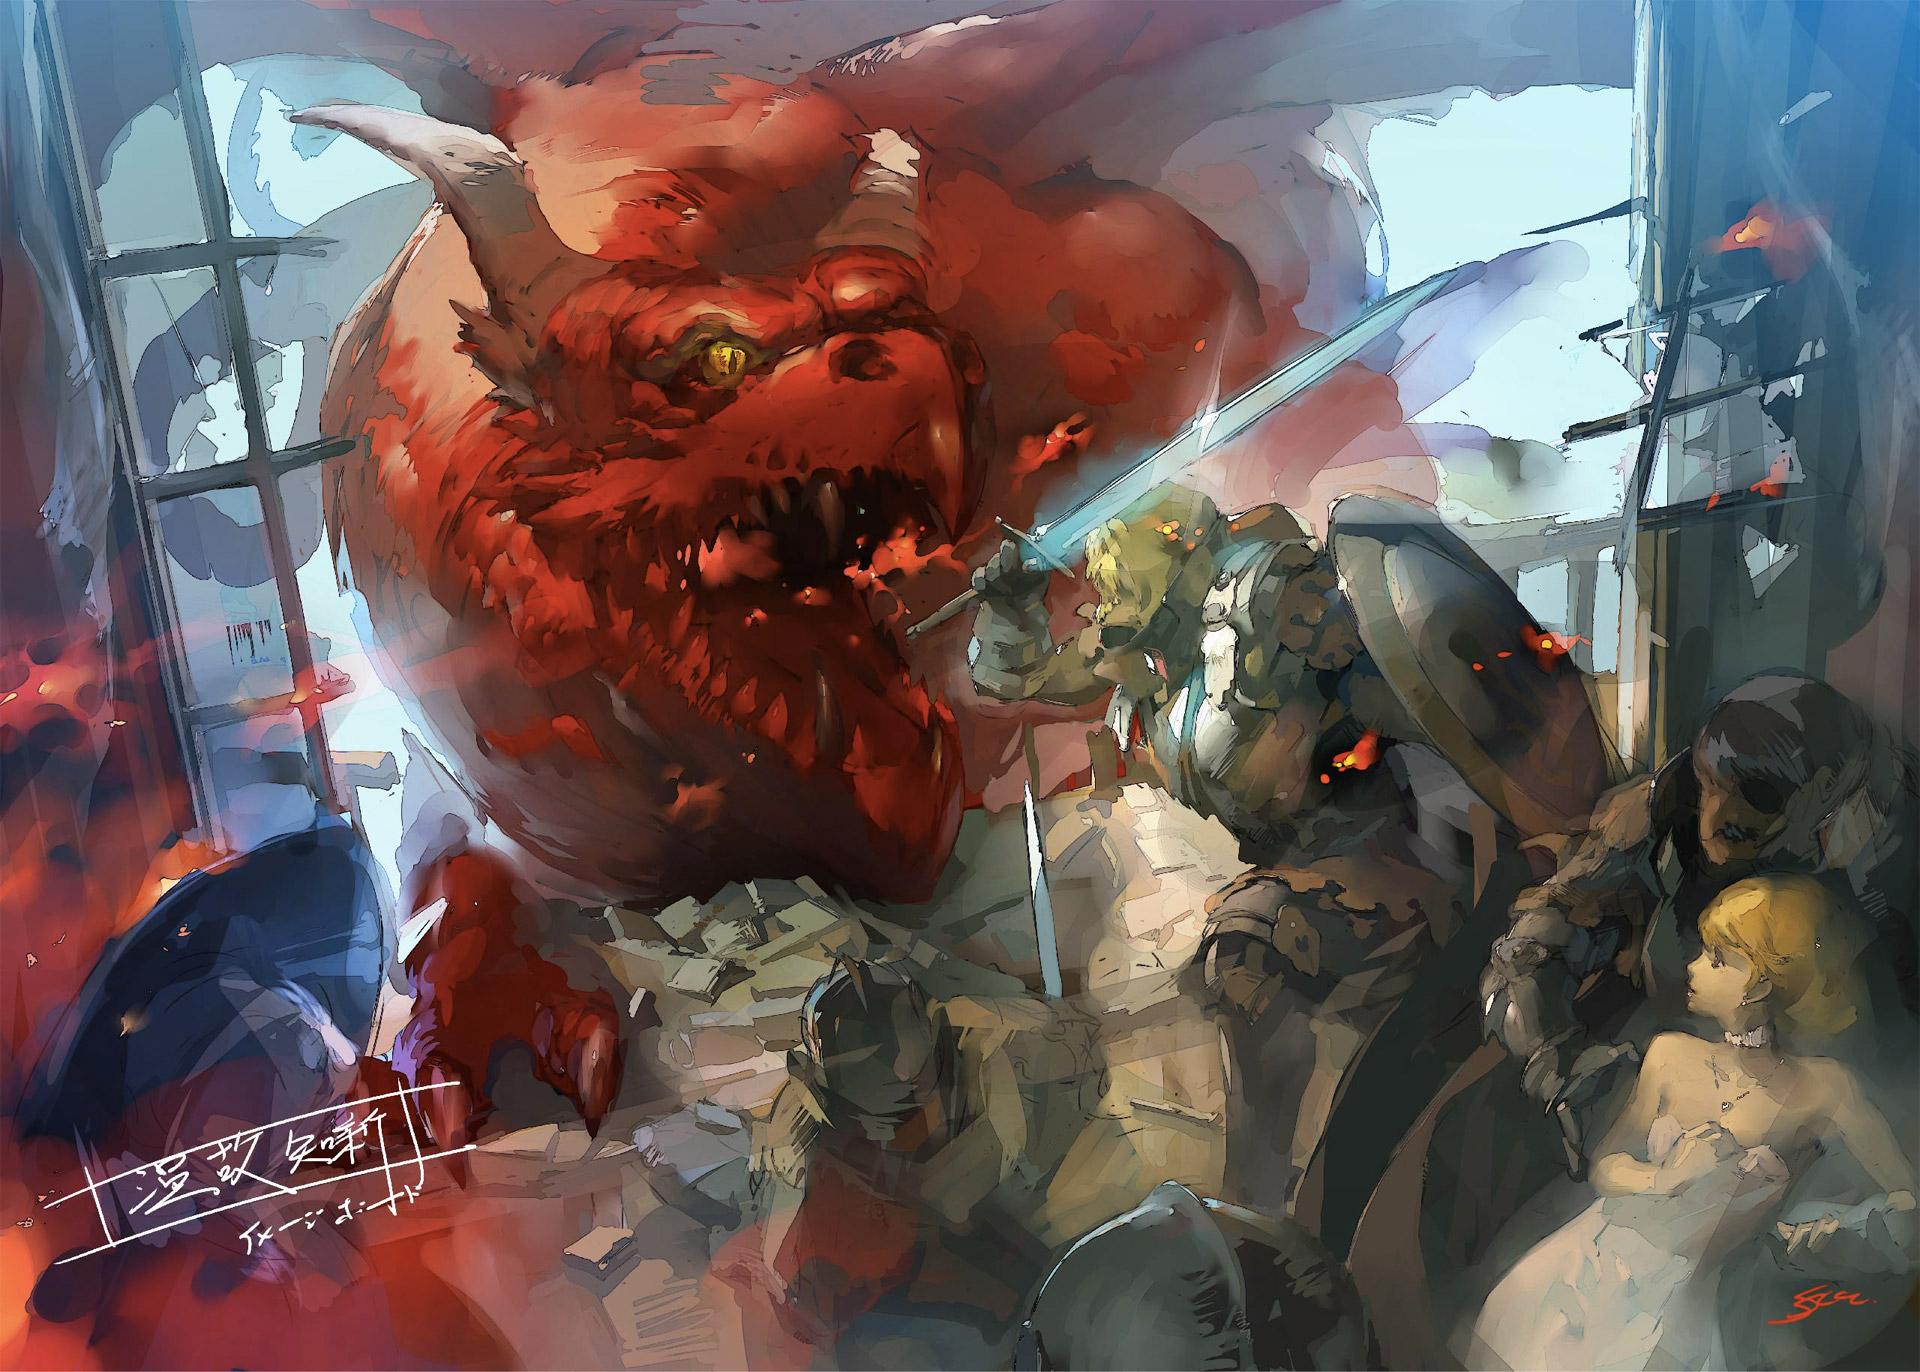 Atlus reveals more details on Persona creators' new fantasy RPG